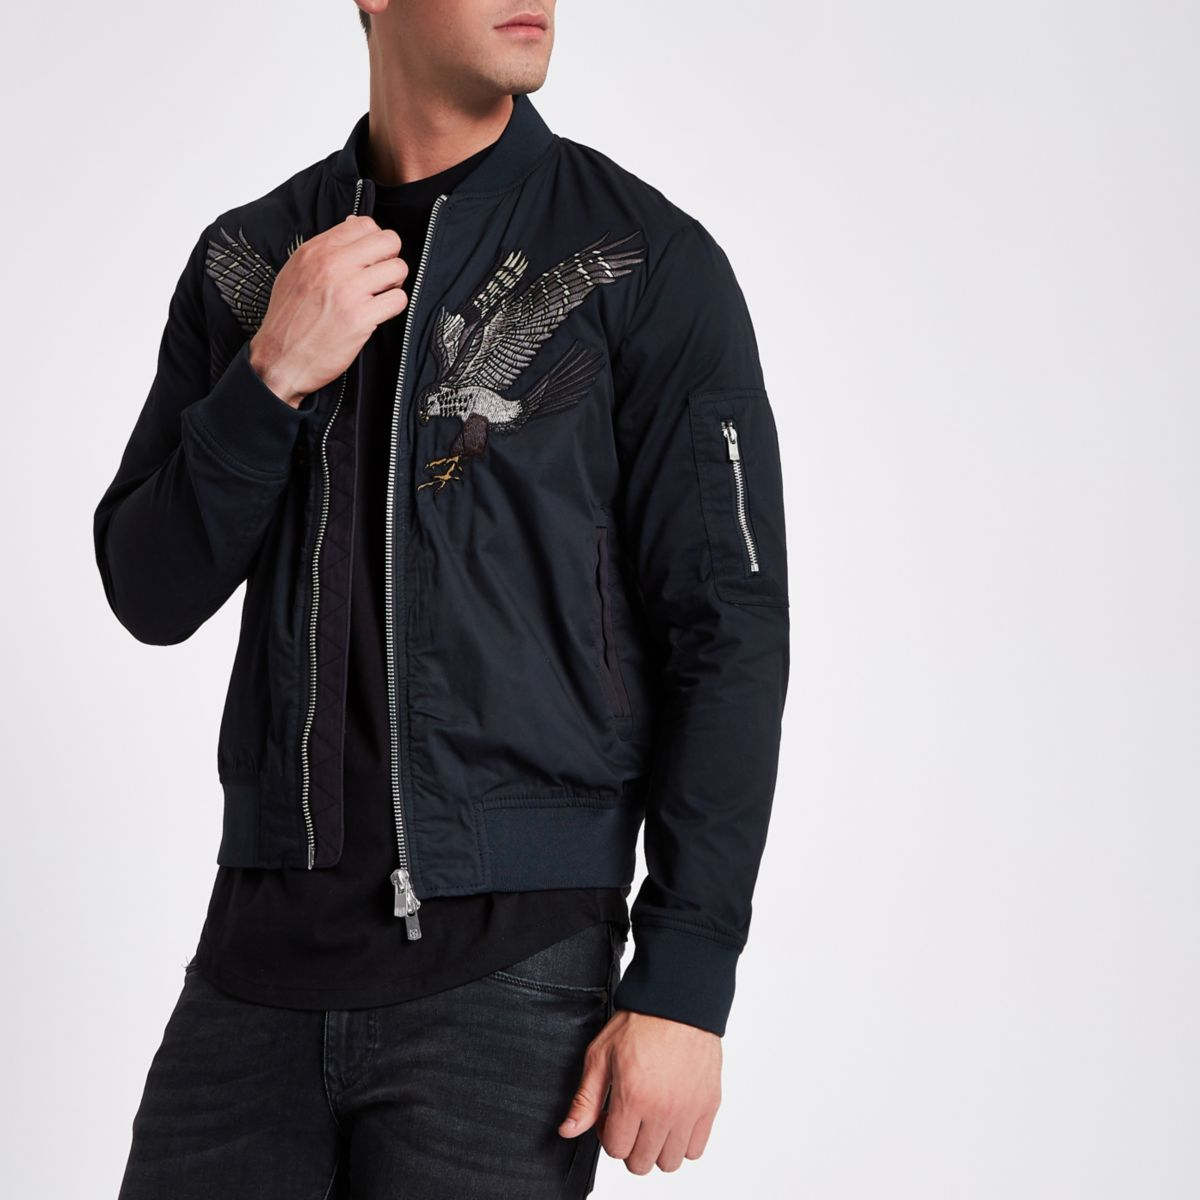 Navy Jack & Jones bomber jacket